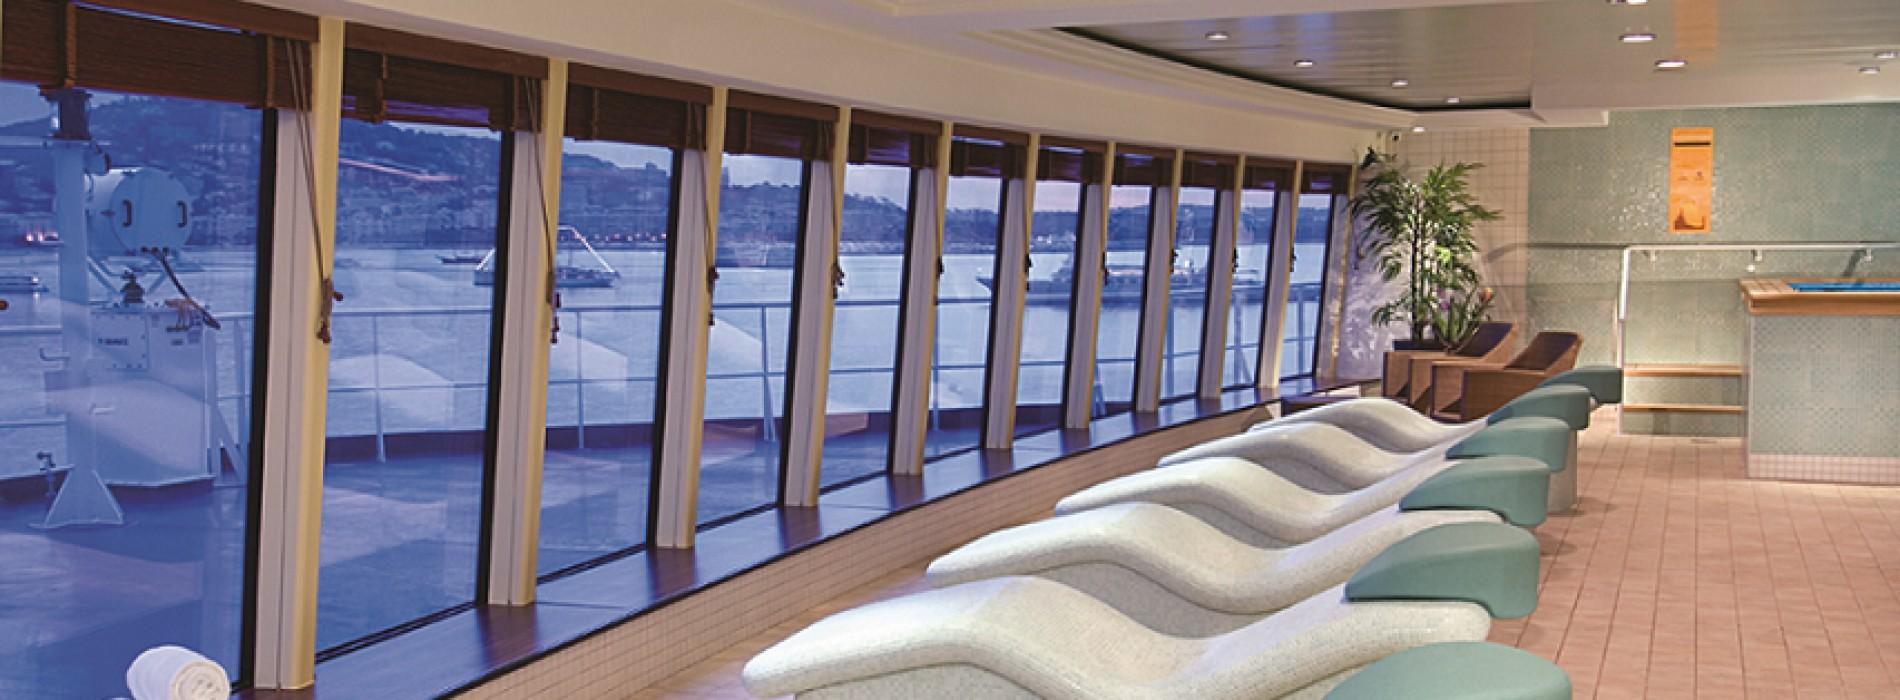 Norwegian Cruise – a trending multi-generational family getaway option for travellers